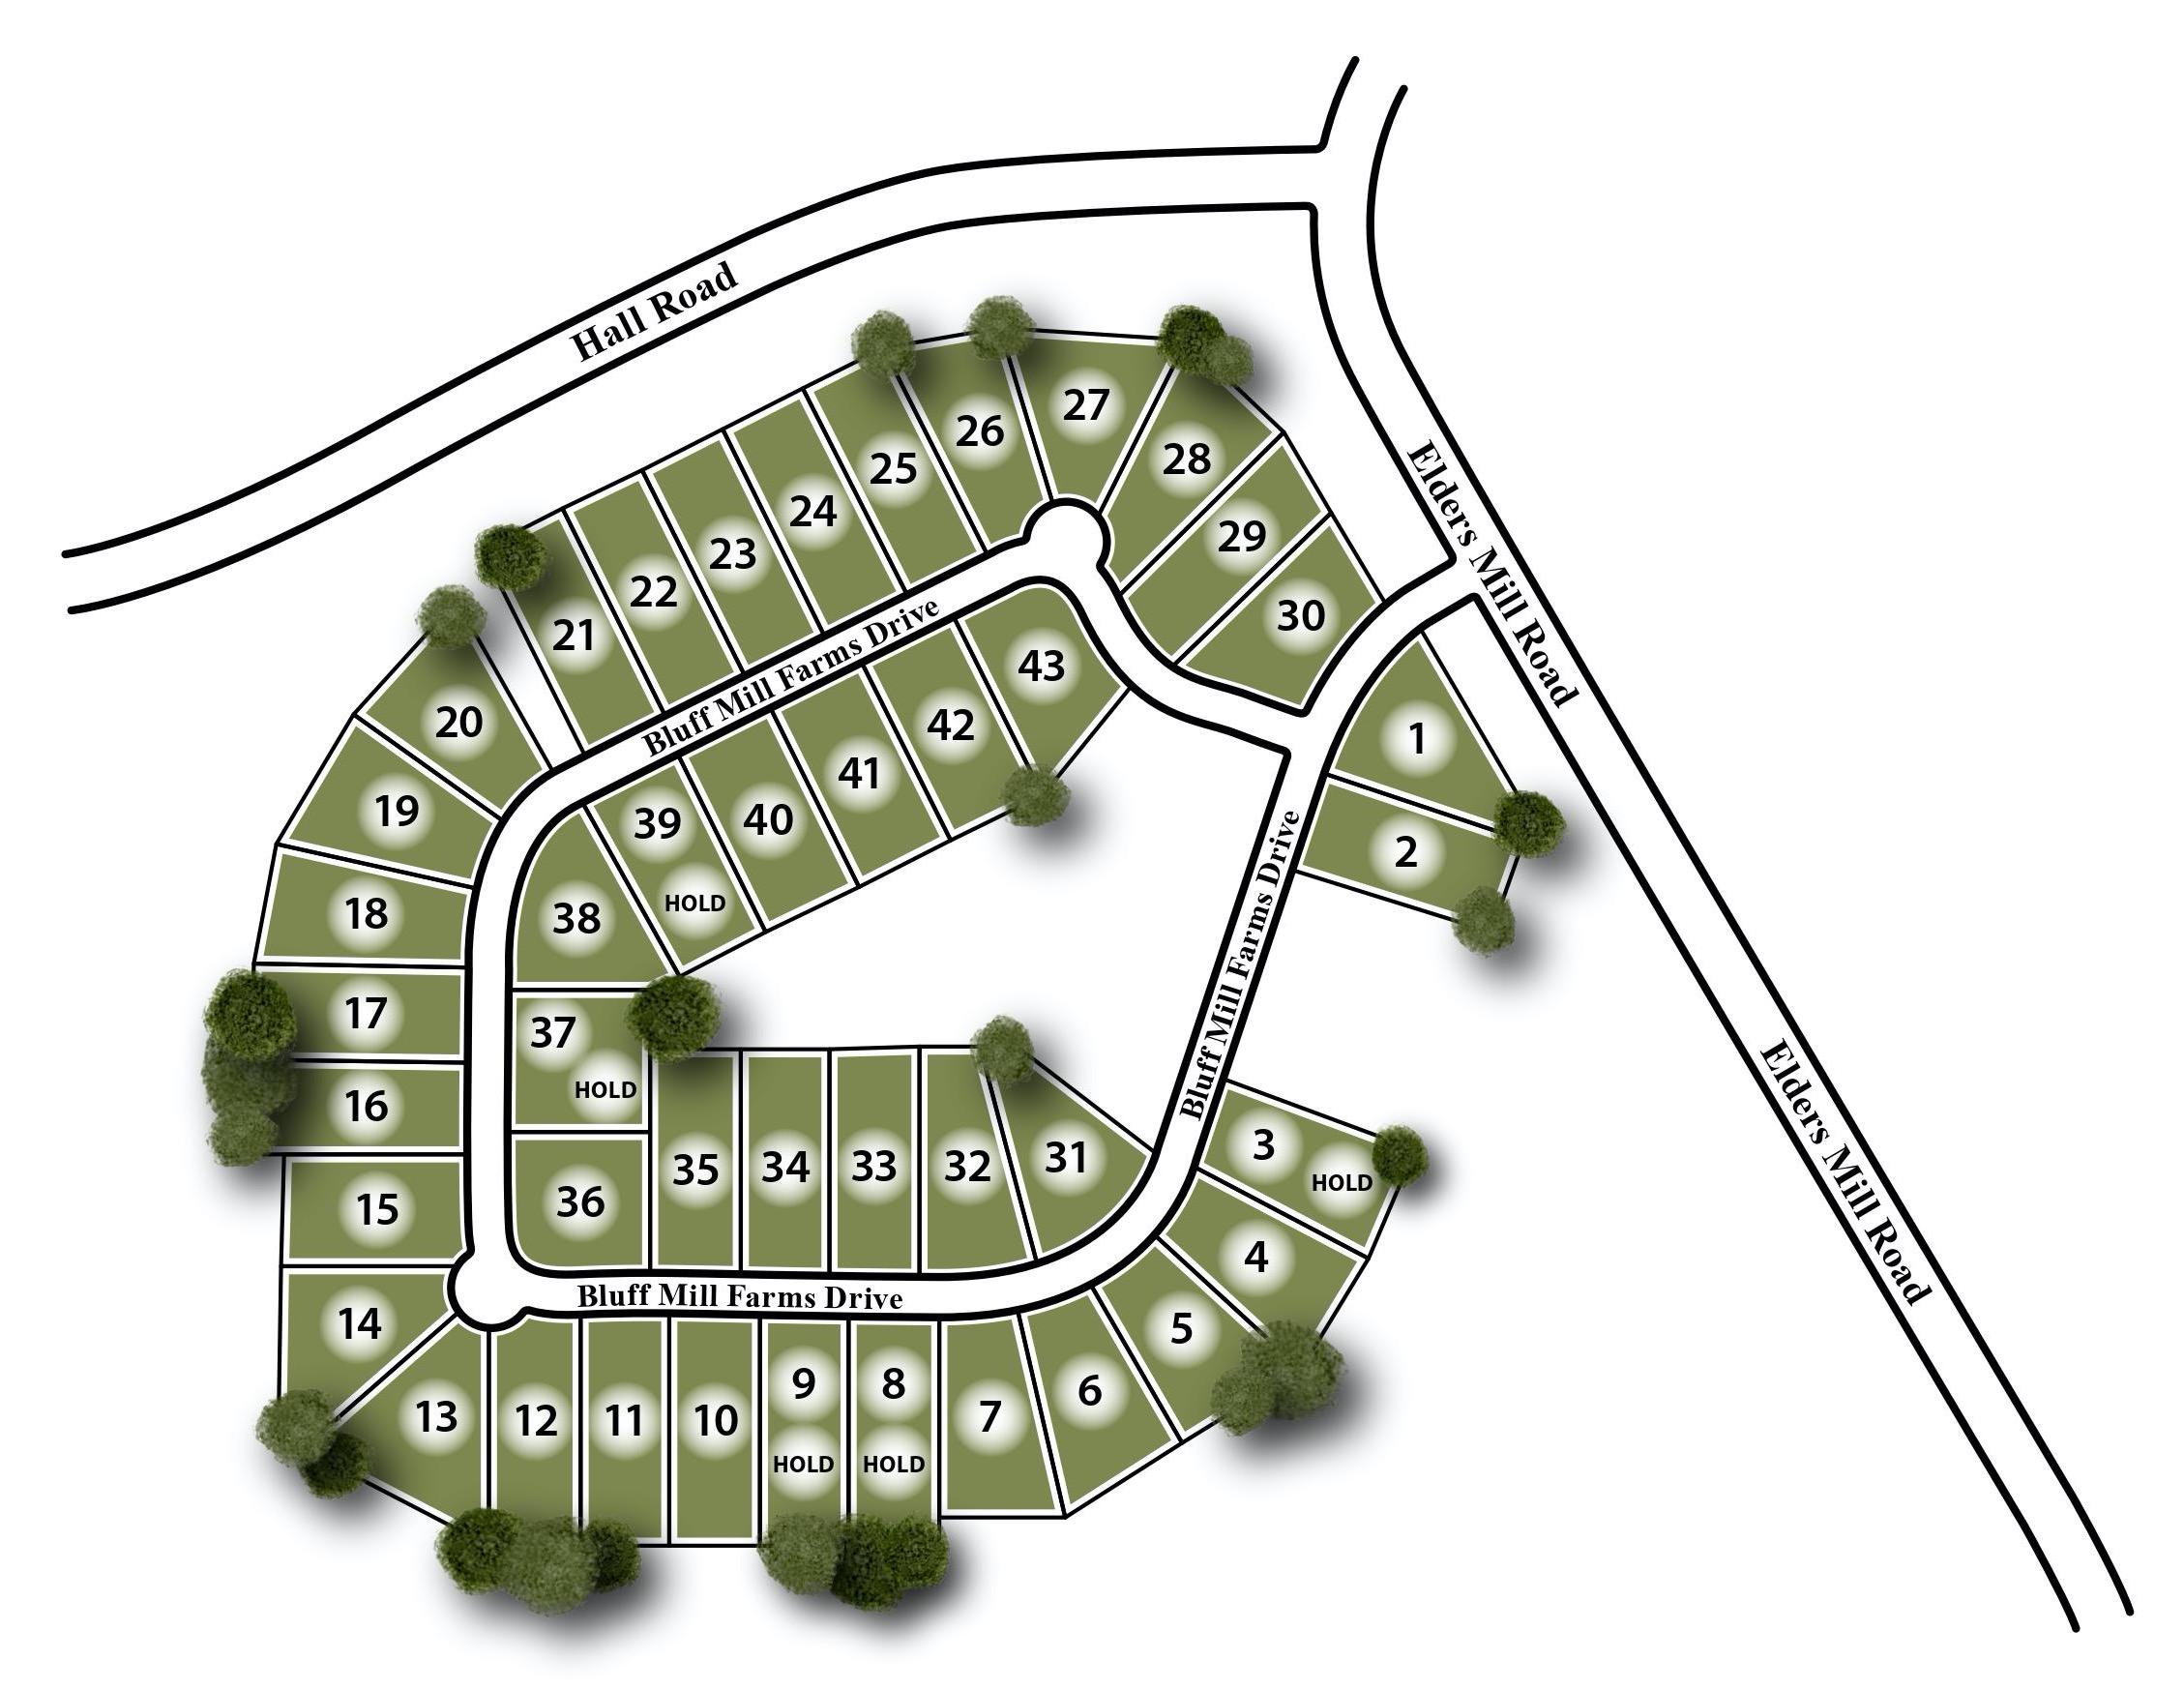 Bluff Mill Farms Site Map